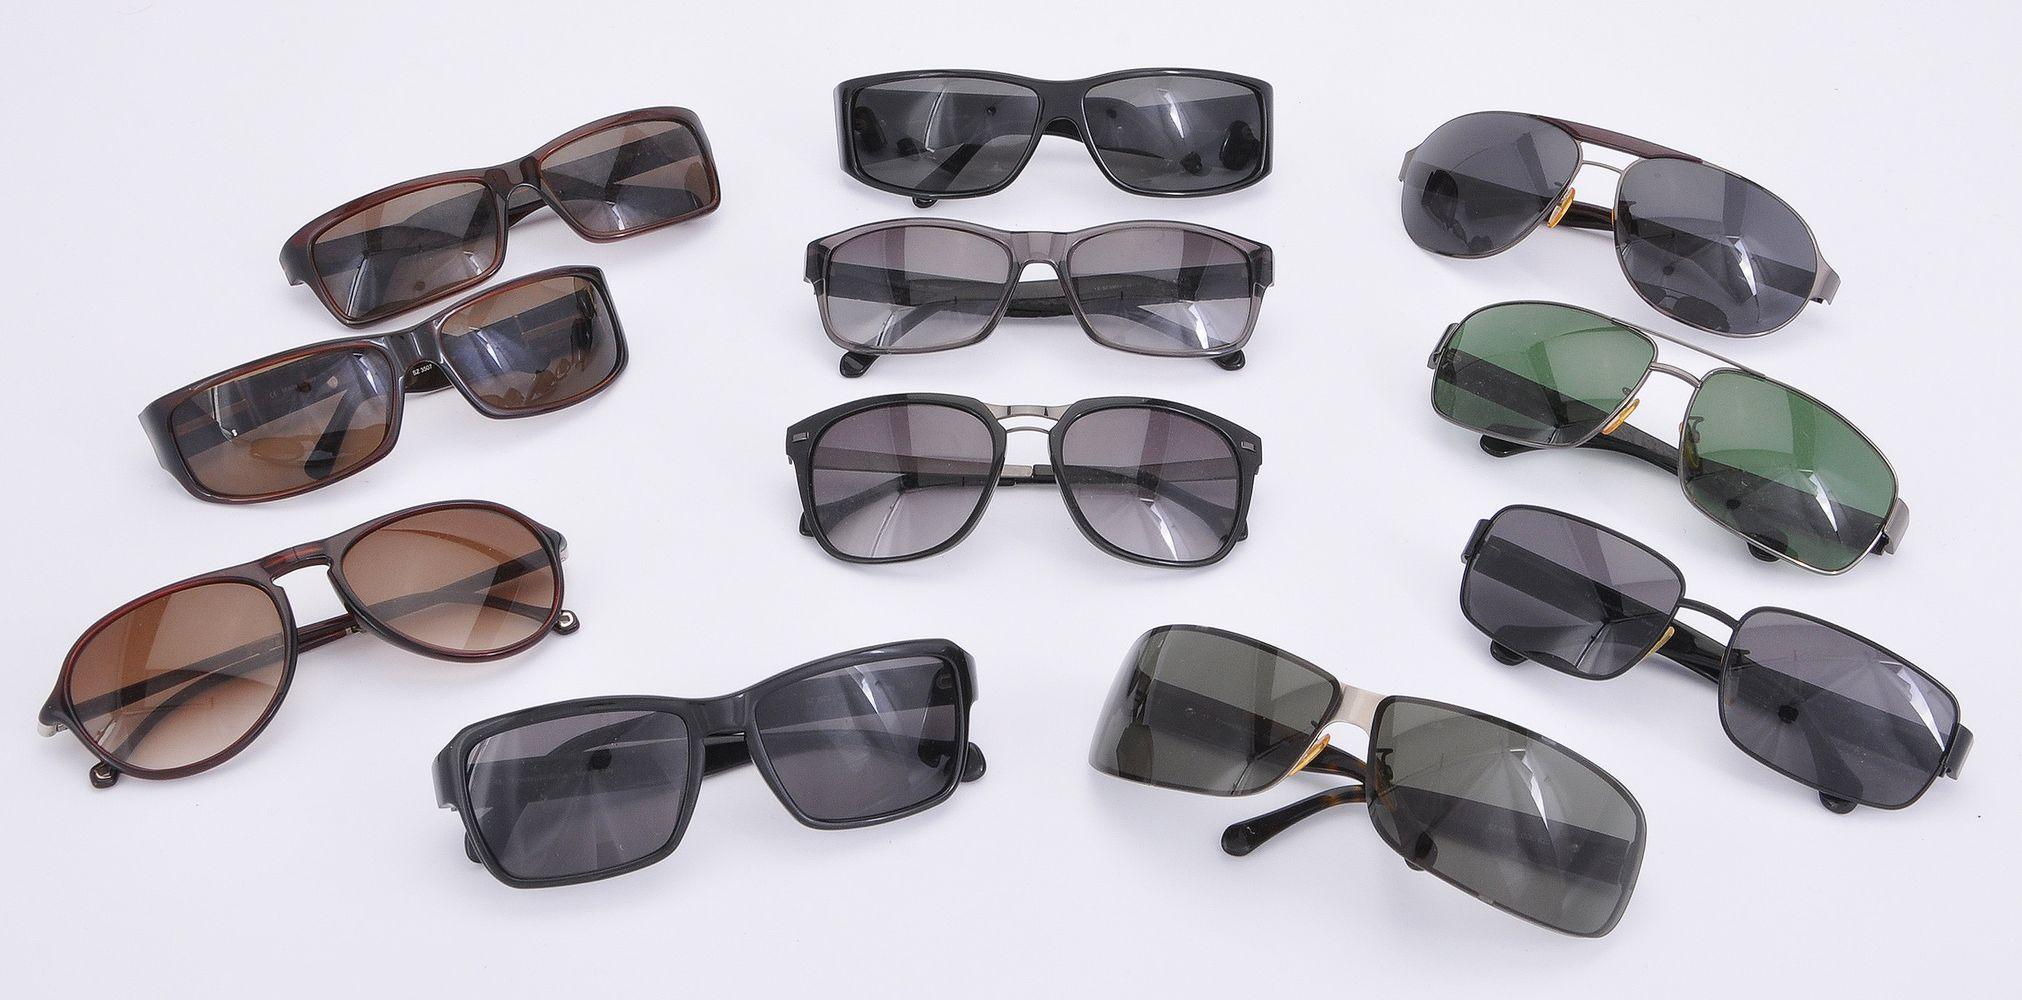 Lot 1086 - A collection of Ermenegildo Zegna sunglasses